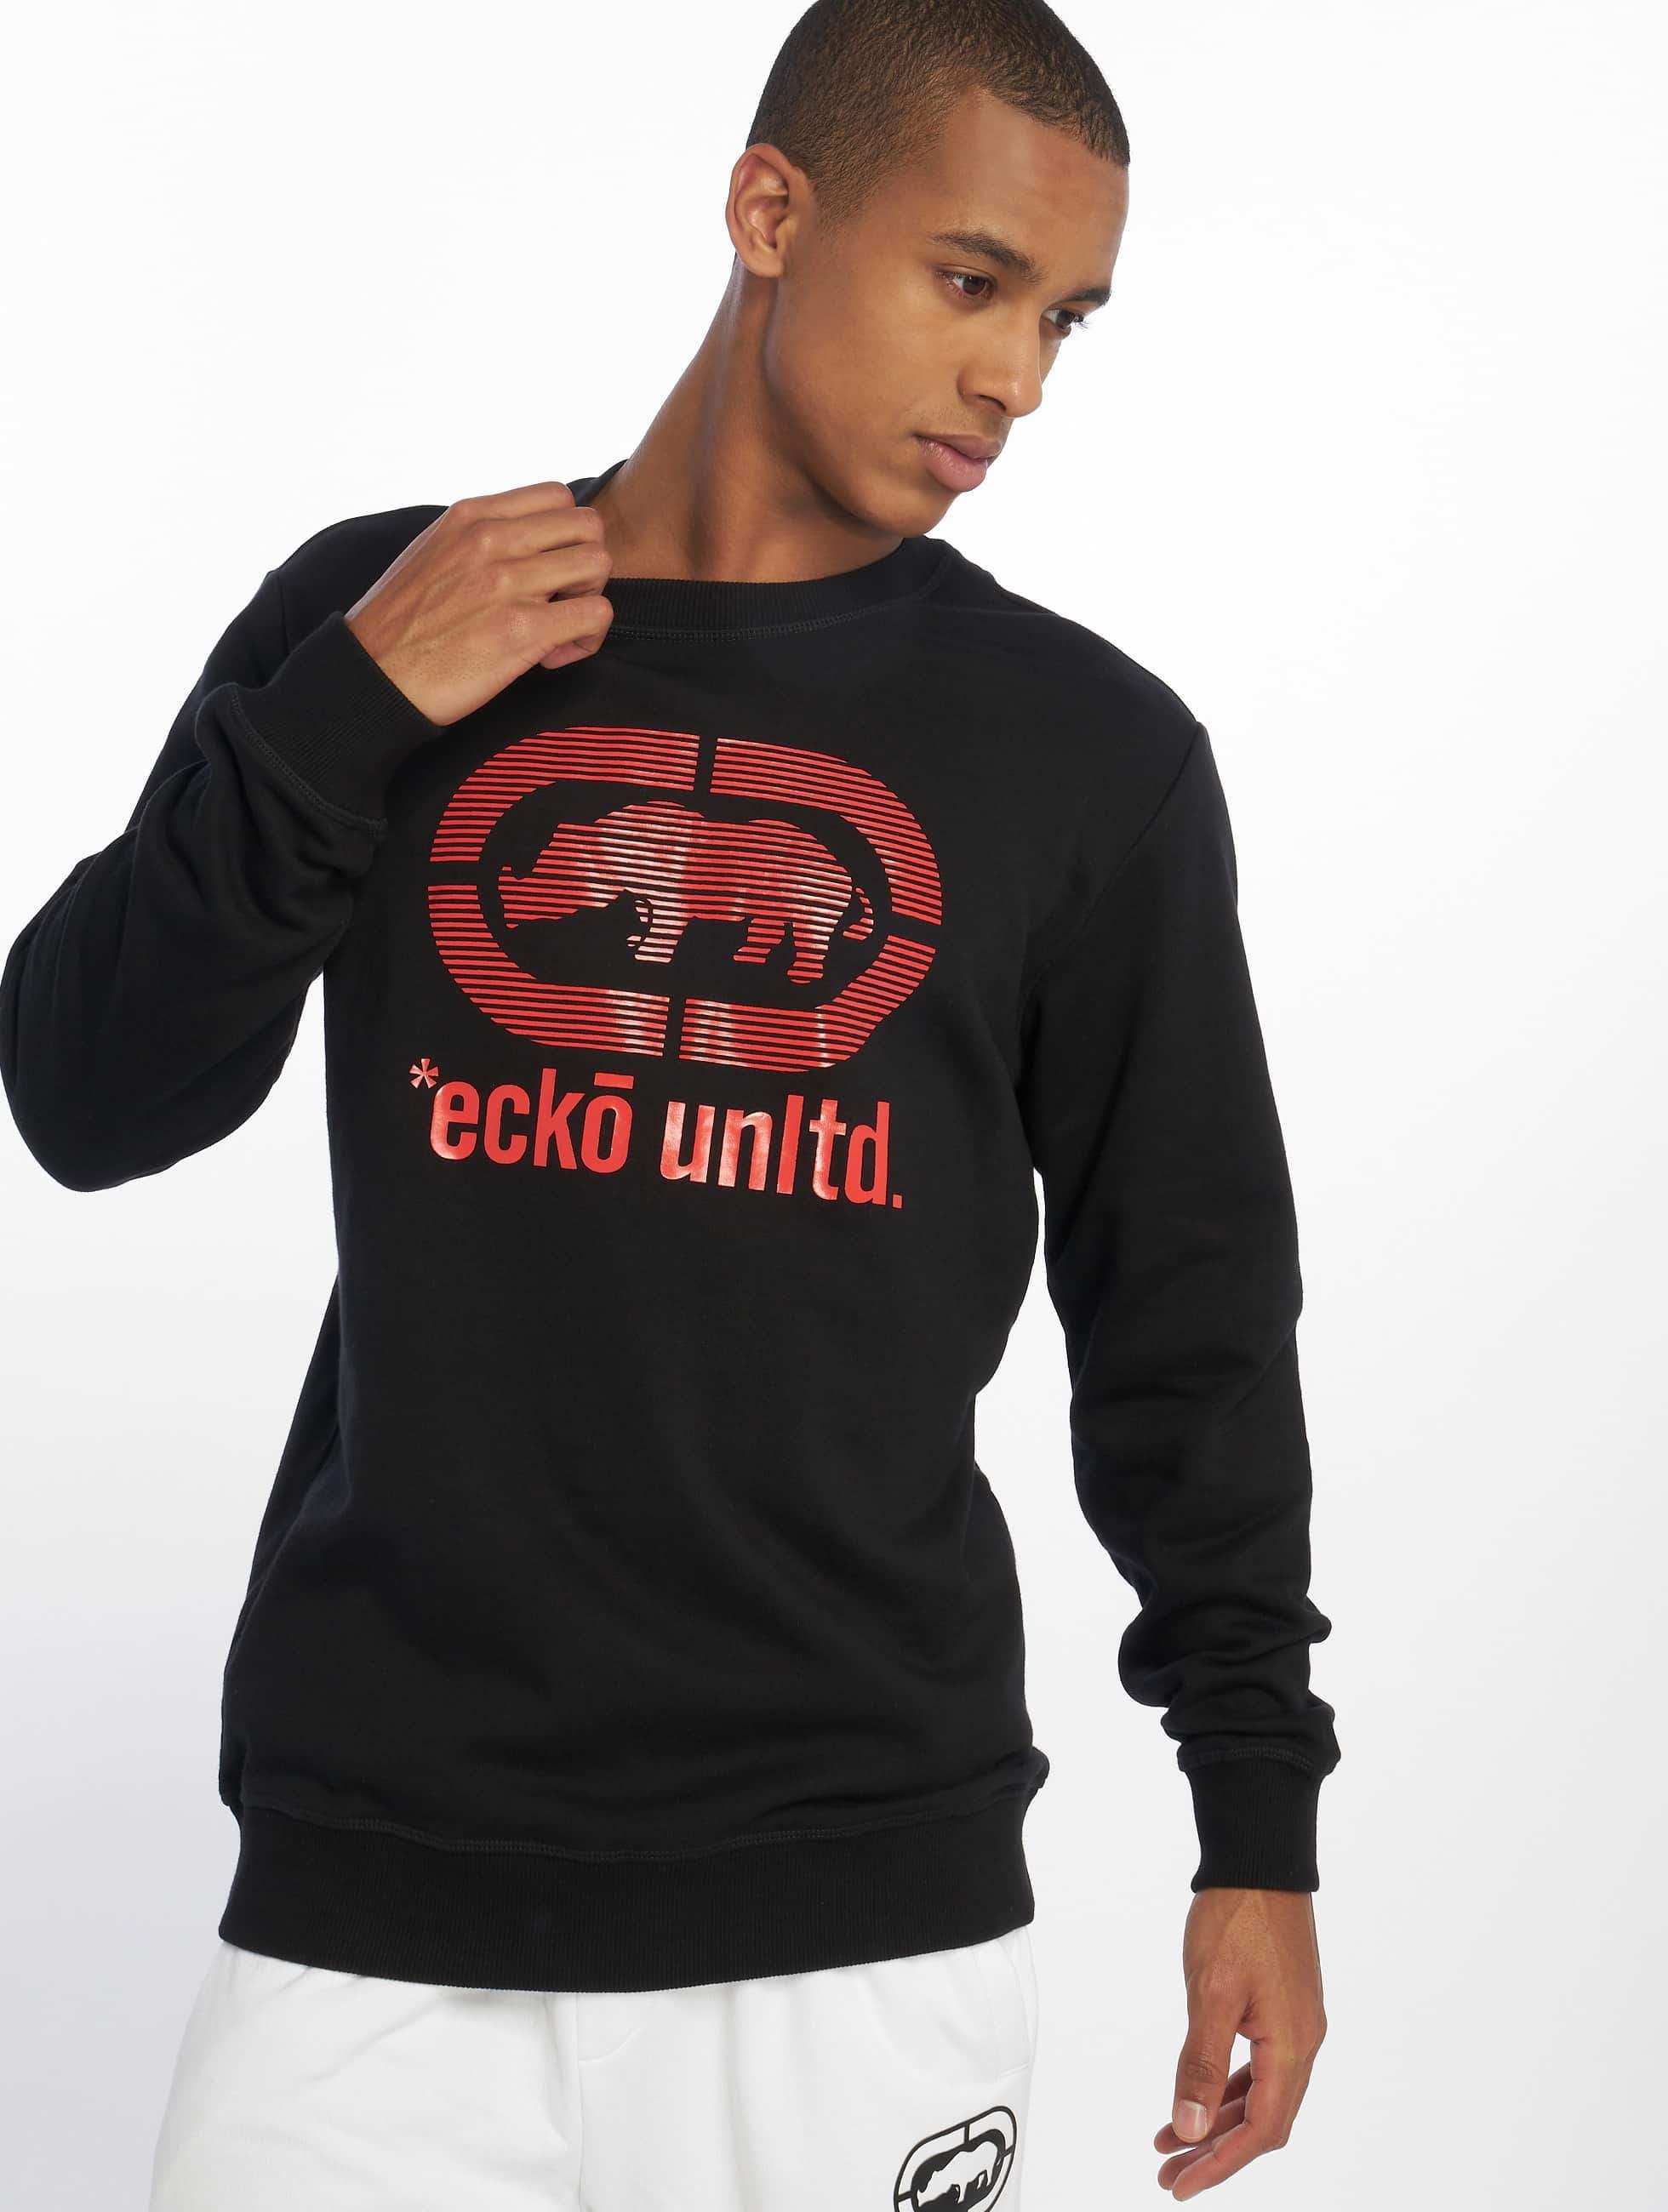 Ecko Unltd. / Jumper West Buddy in black 3XL